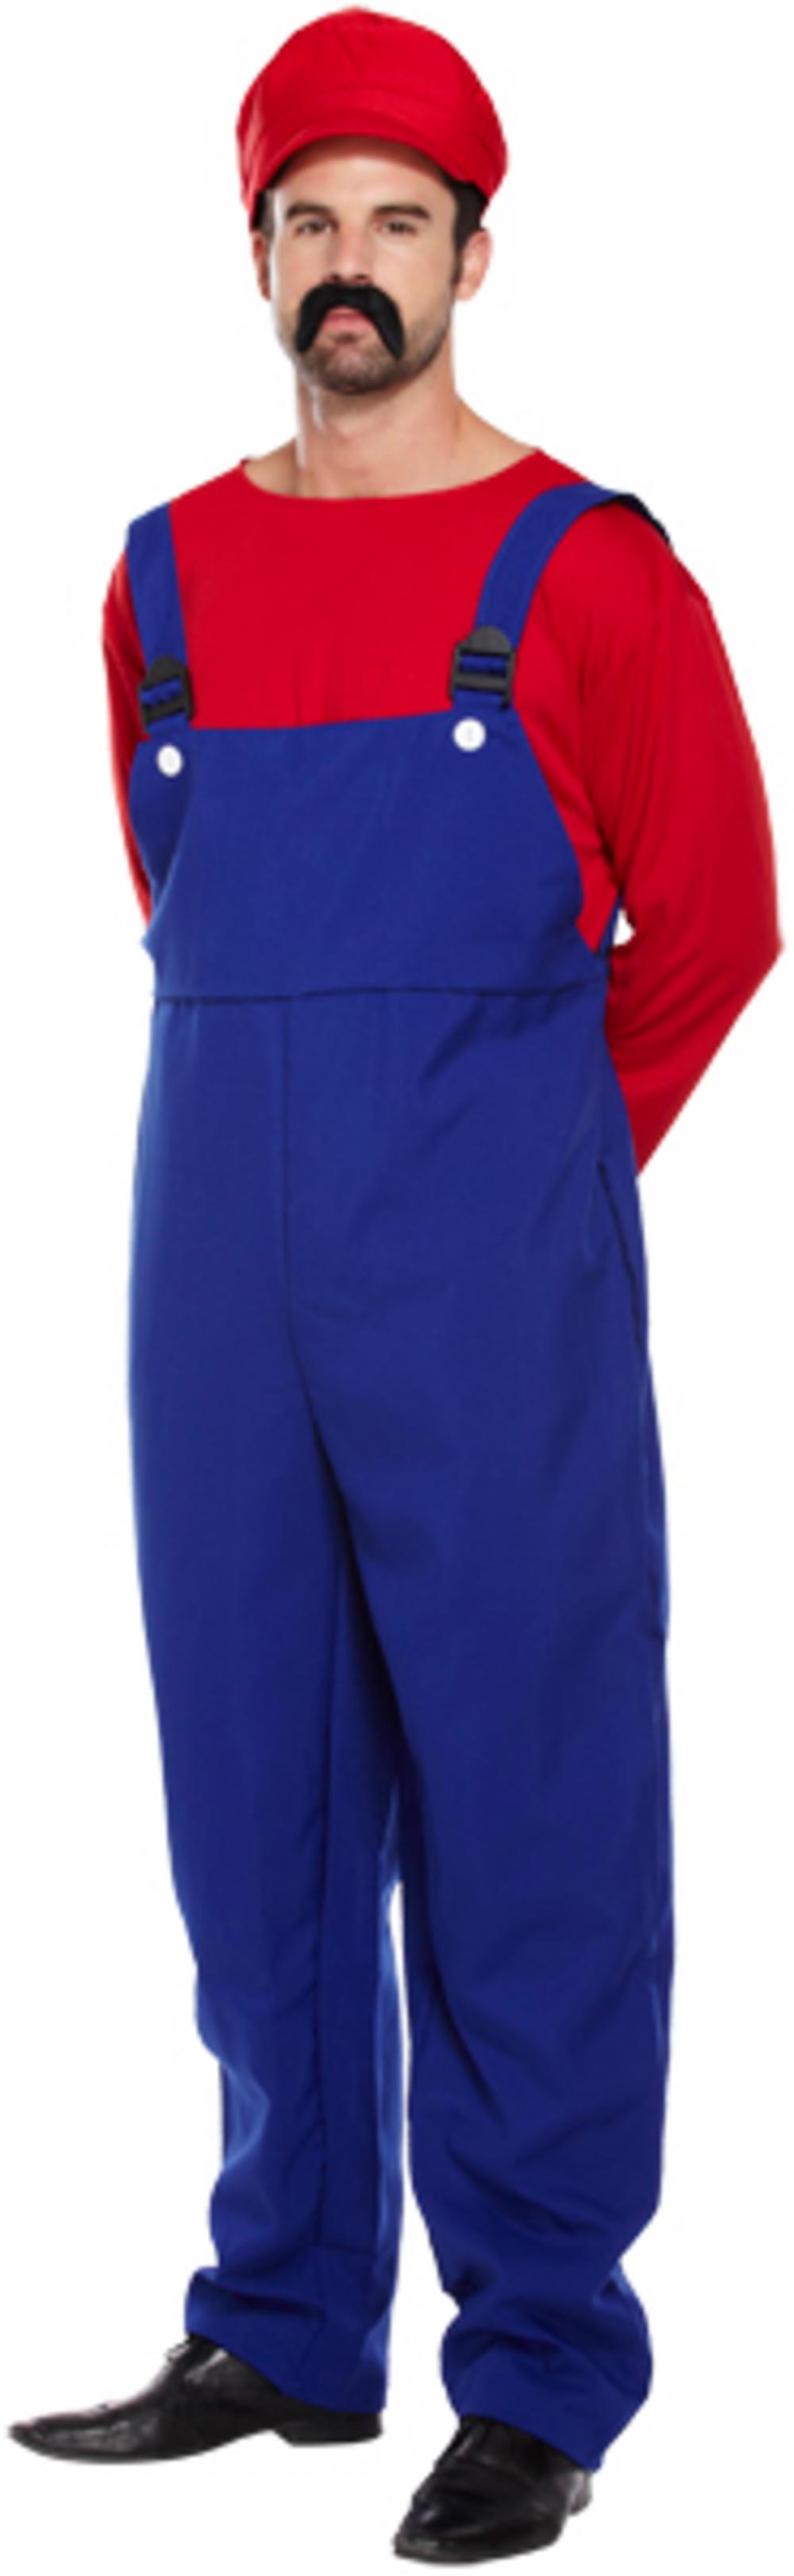 Red Super Workman Mens Costume